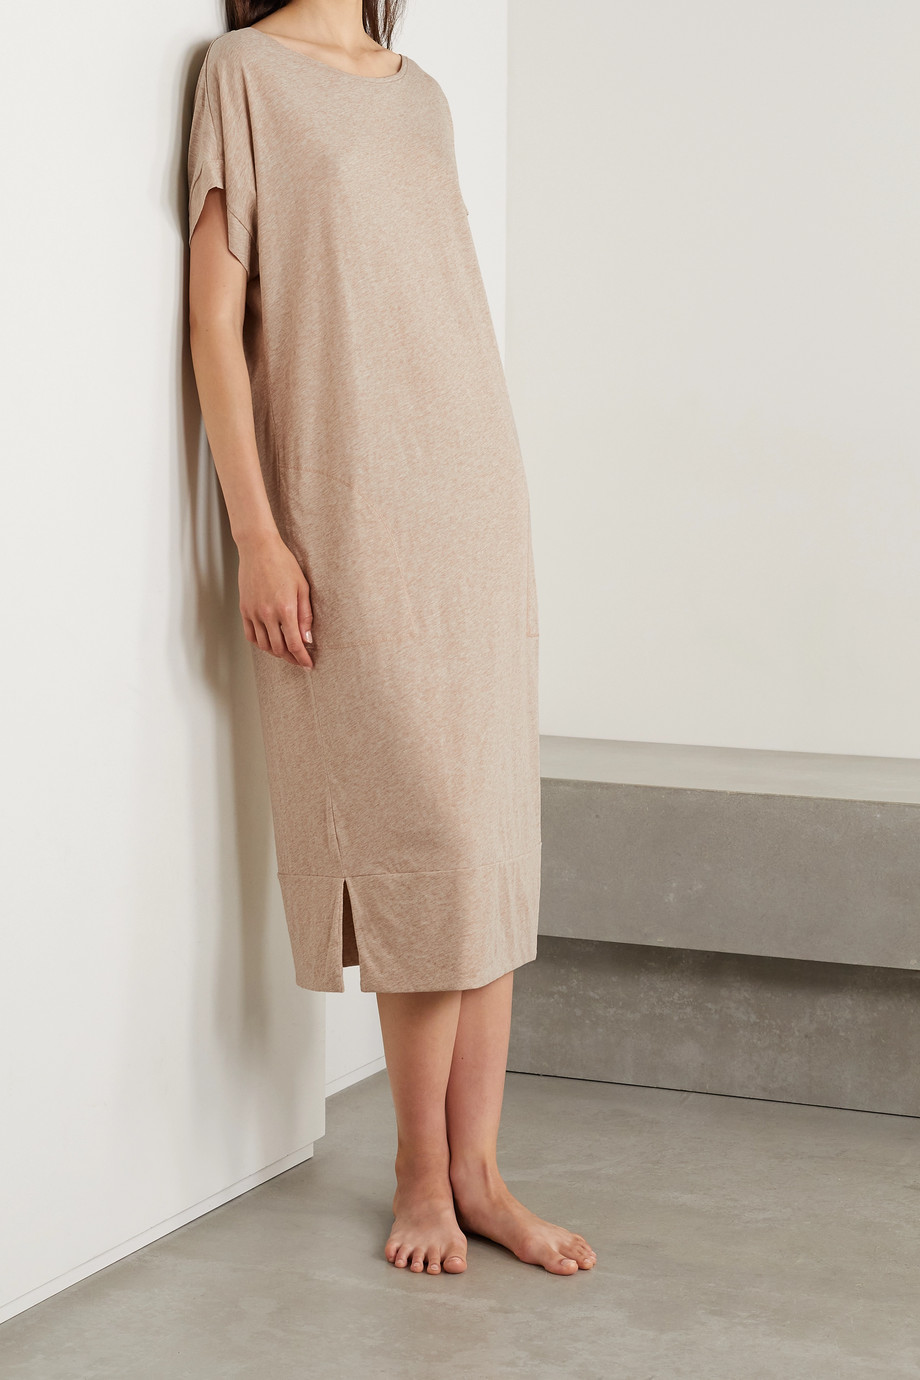 Skin + NET SUSTAIN Cezanne organic Pima cotton-jersey nightdress